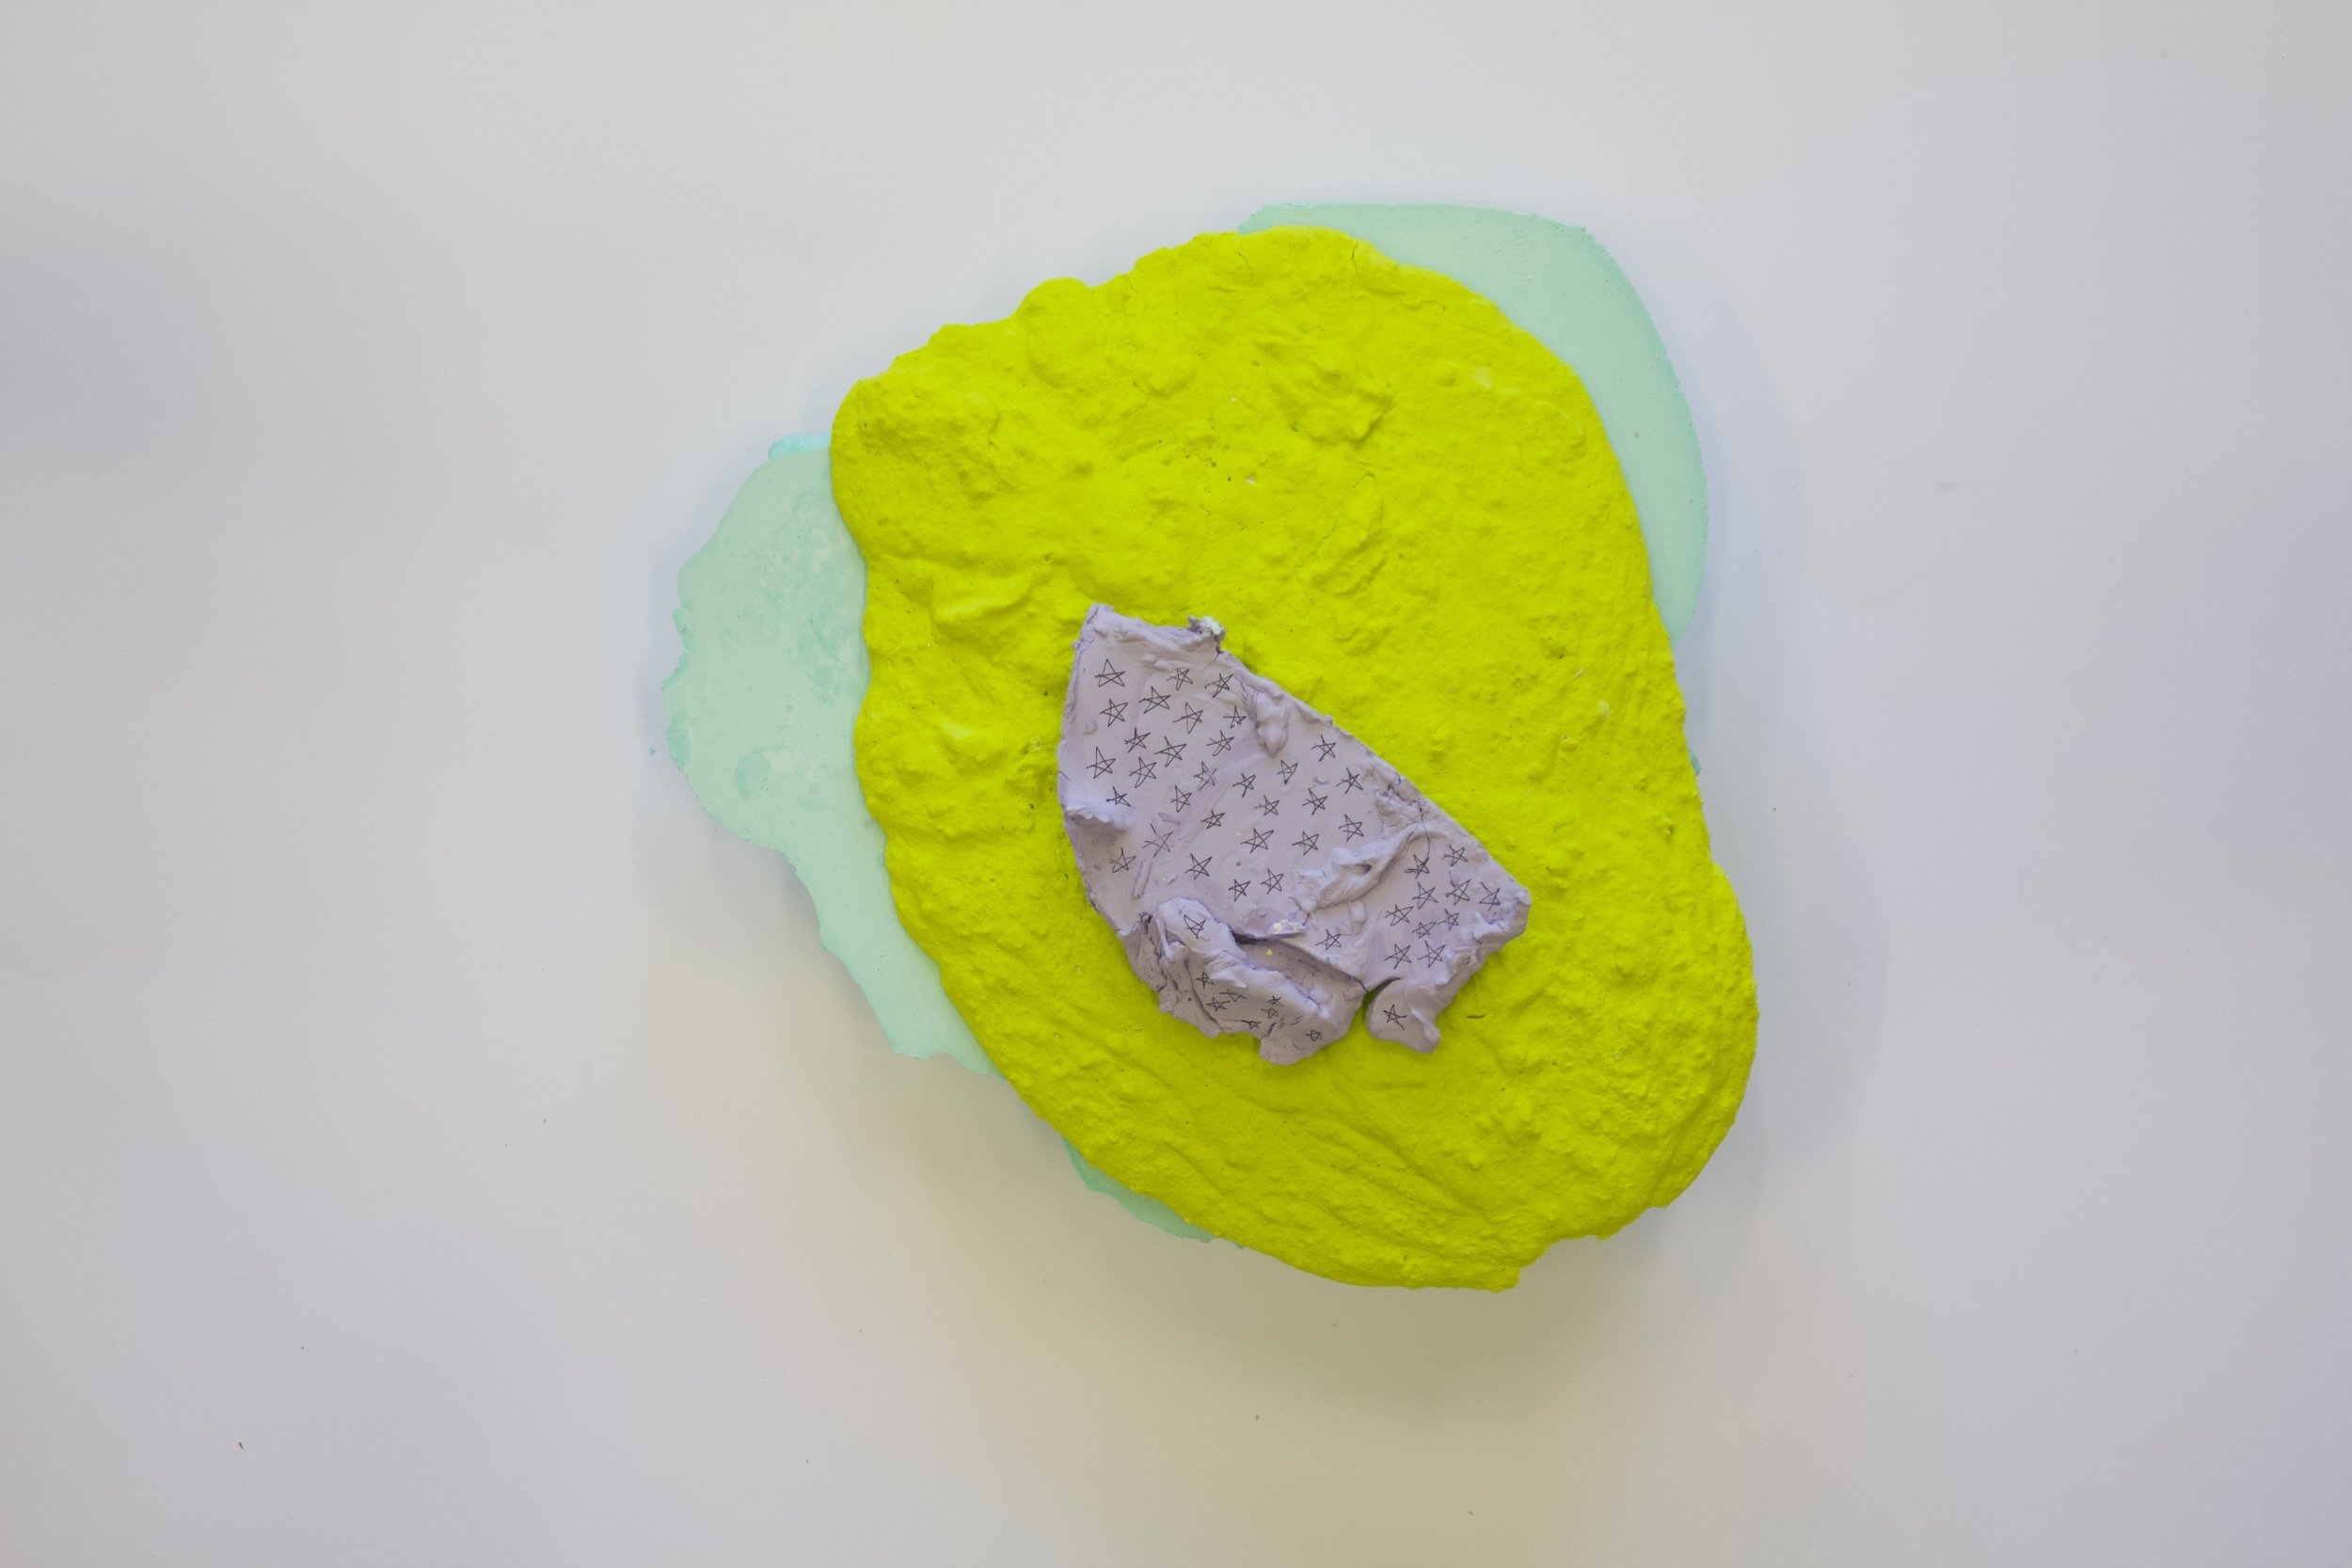 Sculptural Blobs, 2019  Plaster, Dispersion K498, emulsion  7.5cm x 23cm x 24cm